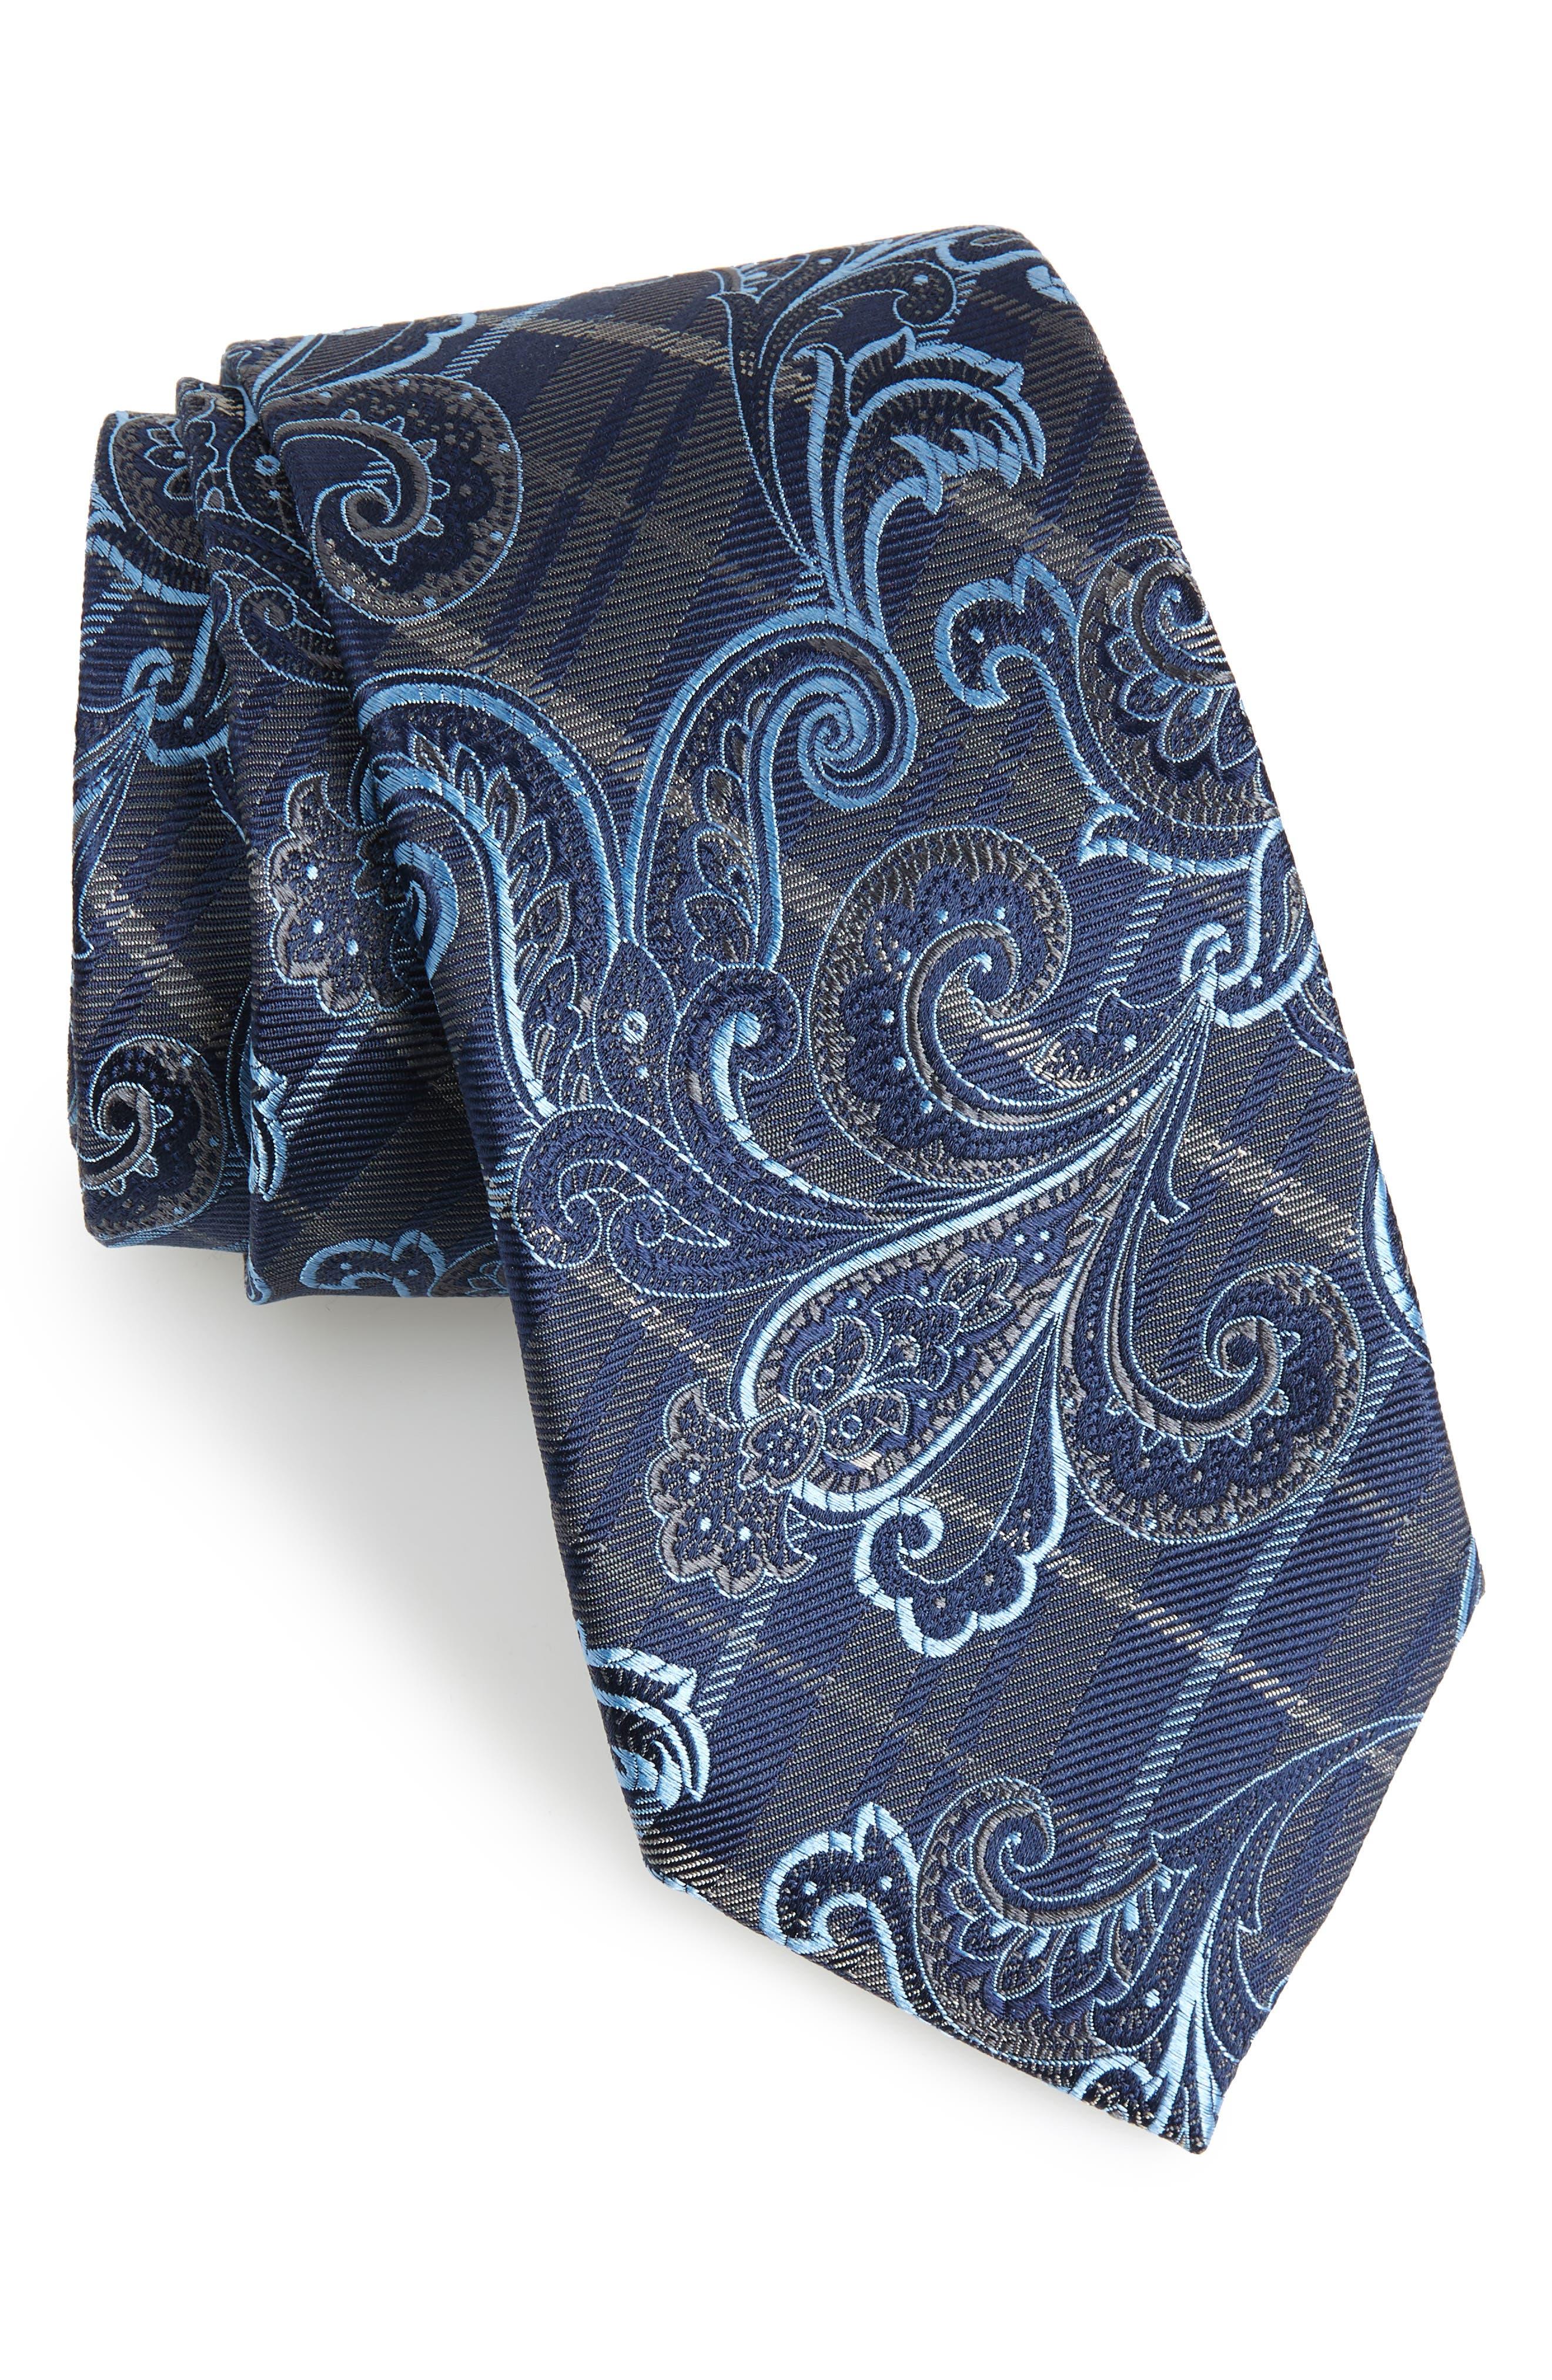 Riscal Paisley Silk Tie,                         Main,                         color, 010